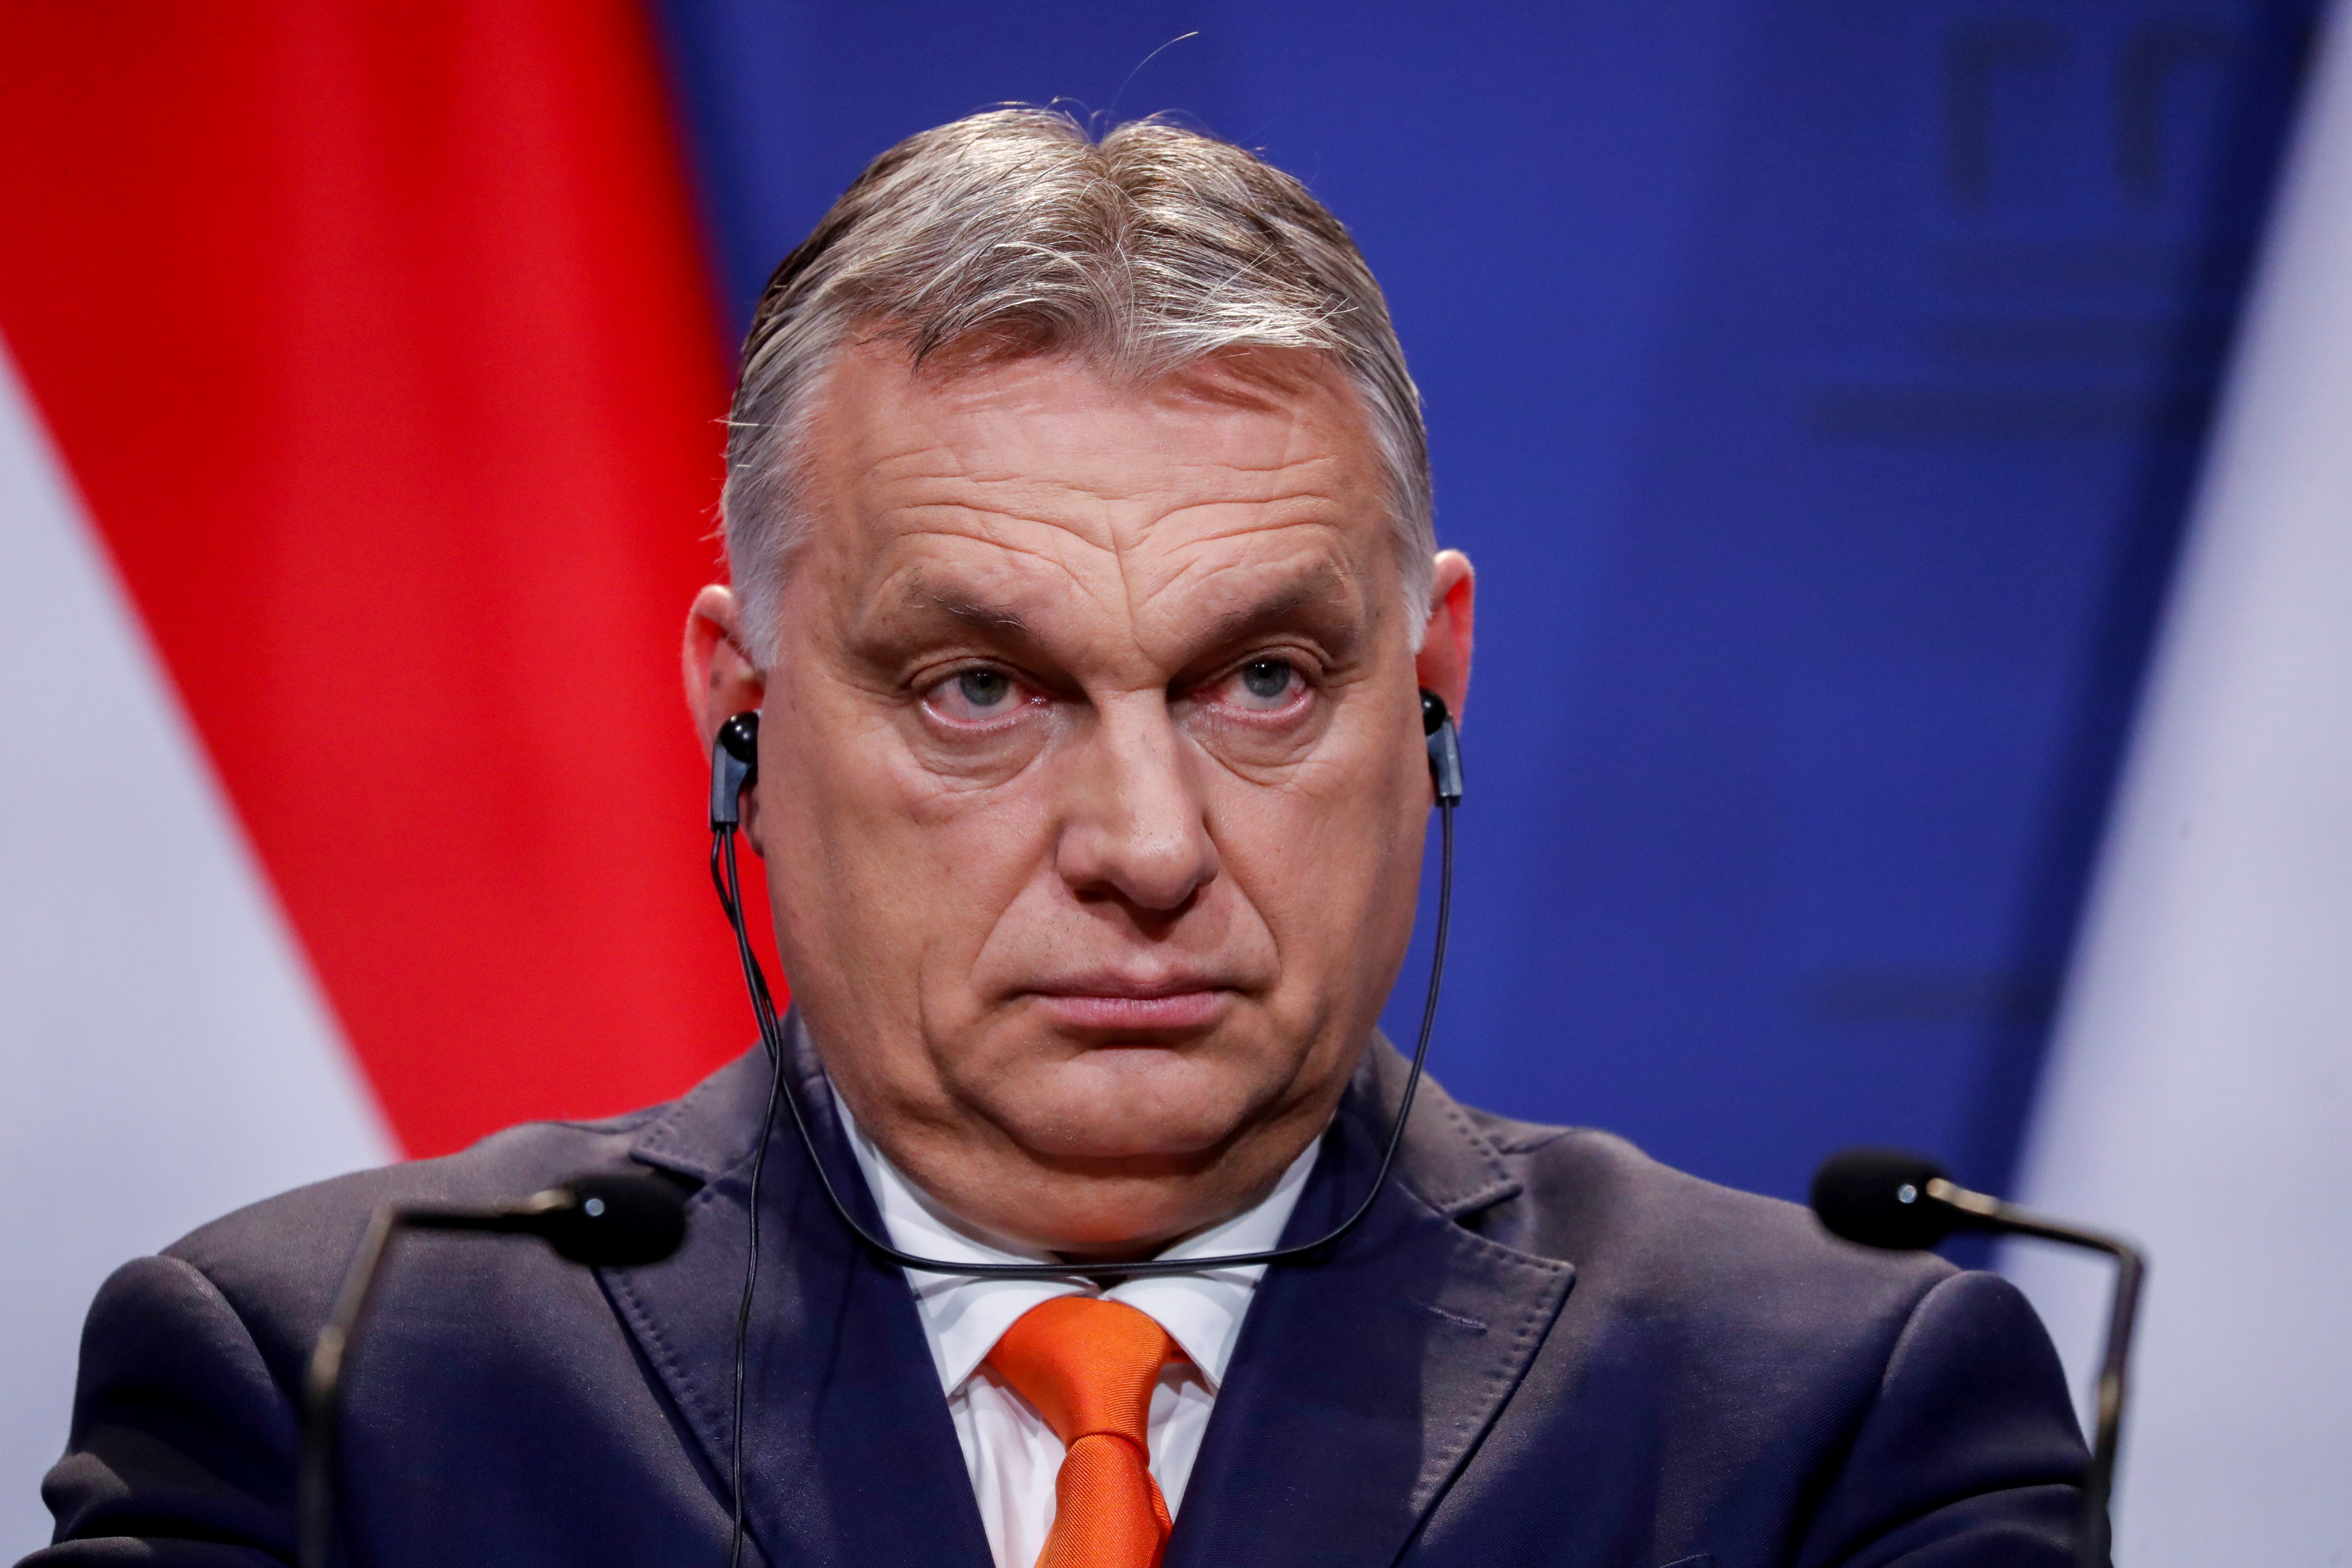 Prif Weinidog Hwngari, Viktor Orban, yn Budapest, Hwngari, Ebrill 1, 2021. REUTERS / Bernadett Szabo / File File